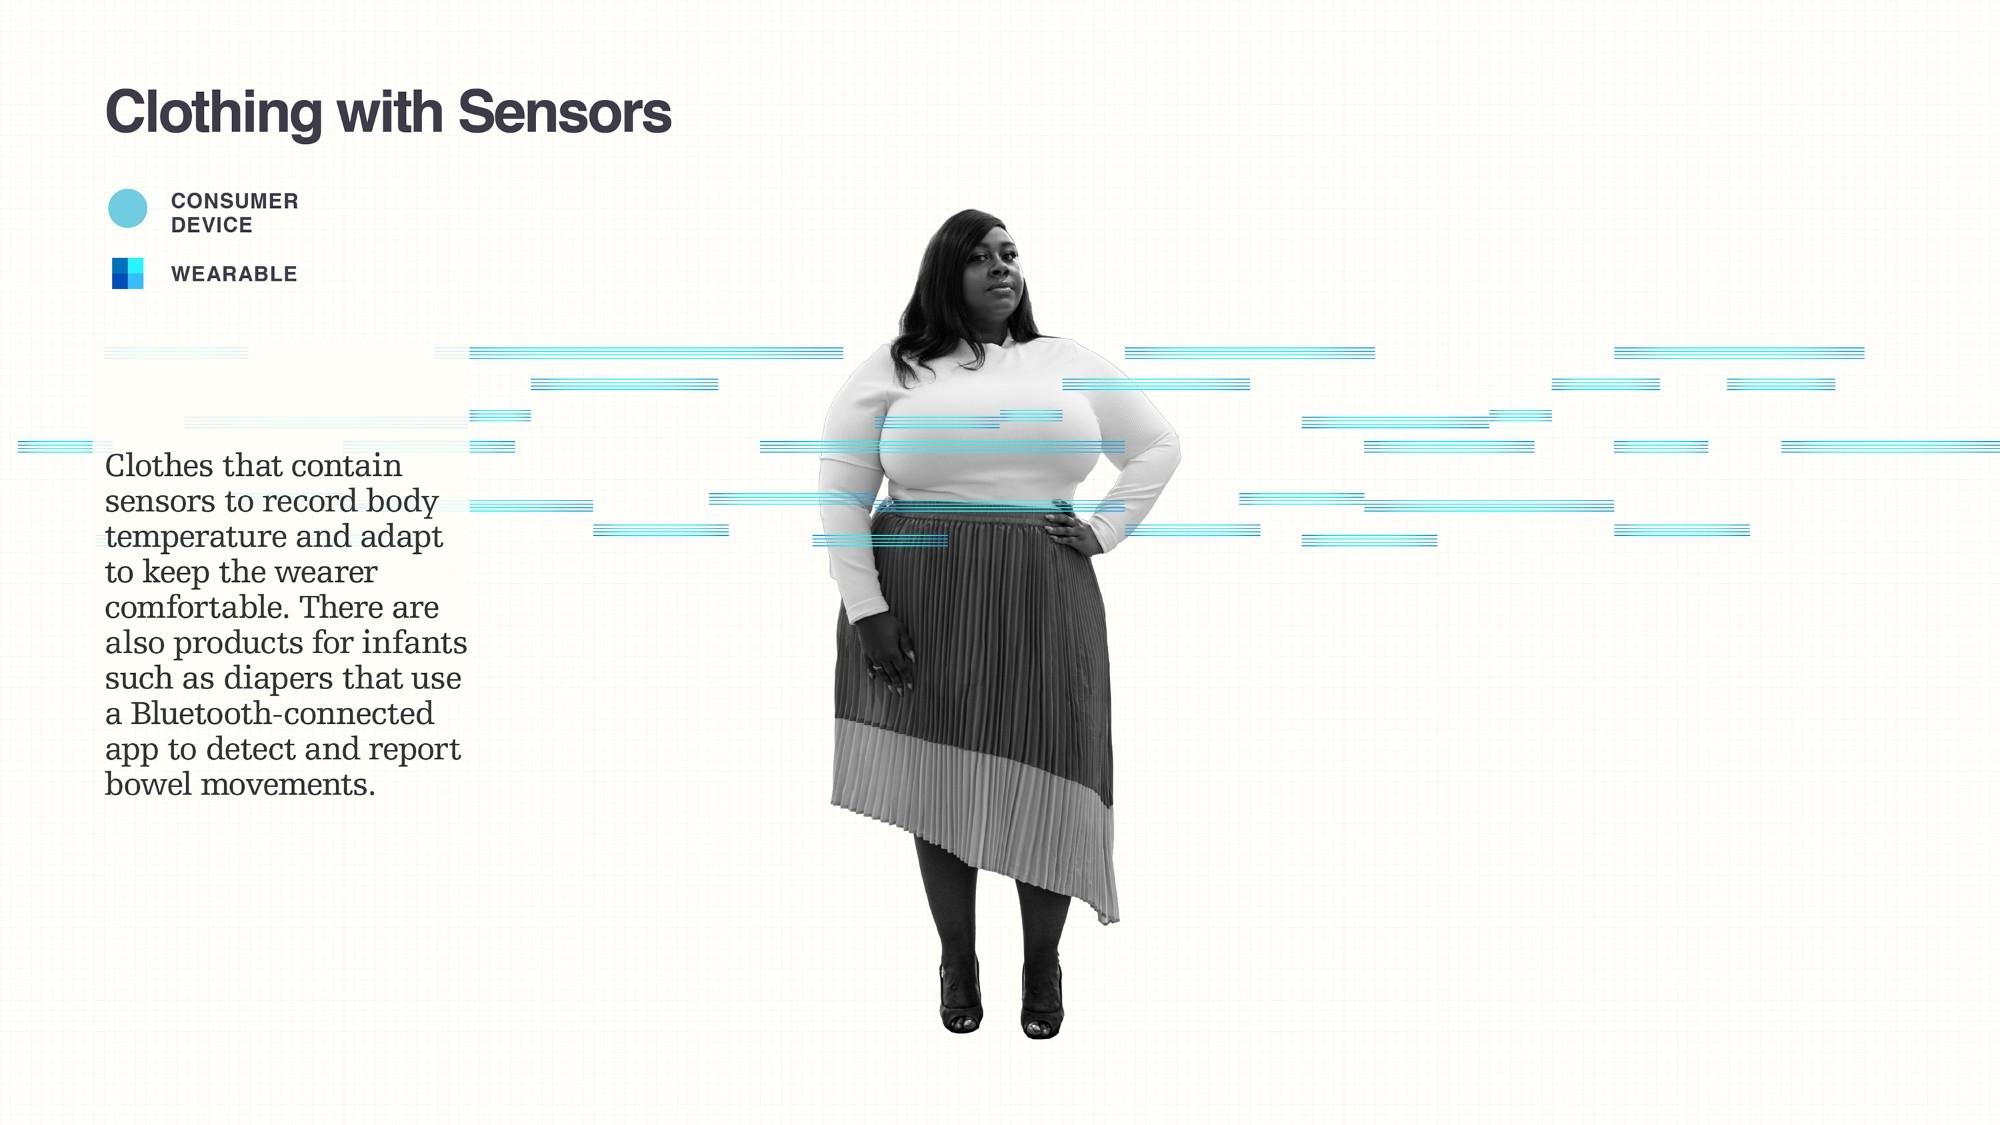 Data visualization illustrating clothing with sensors by Gioriga Lupi.